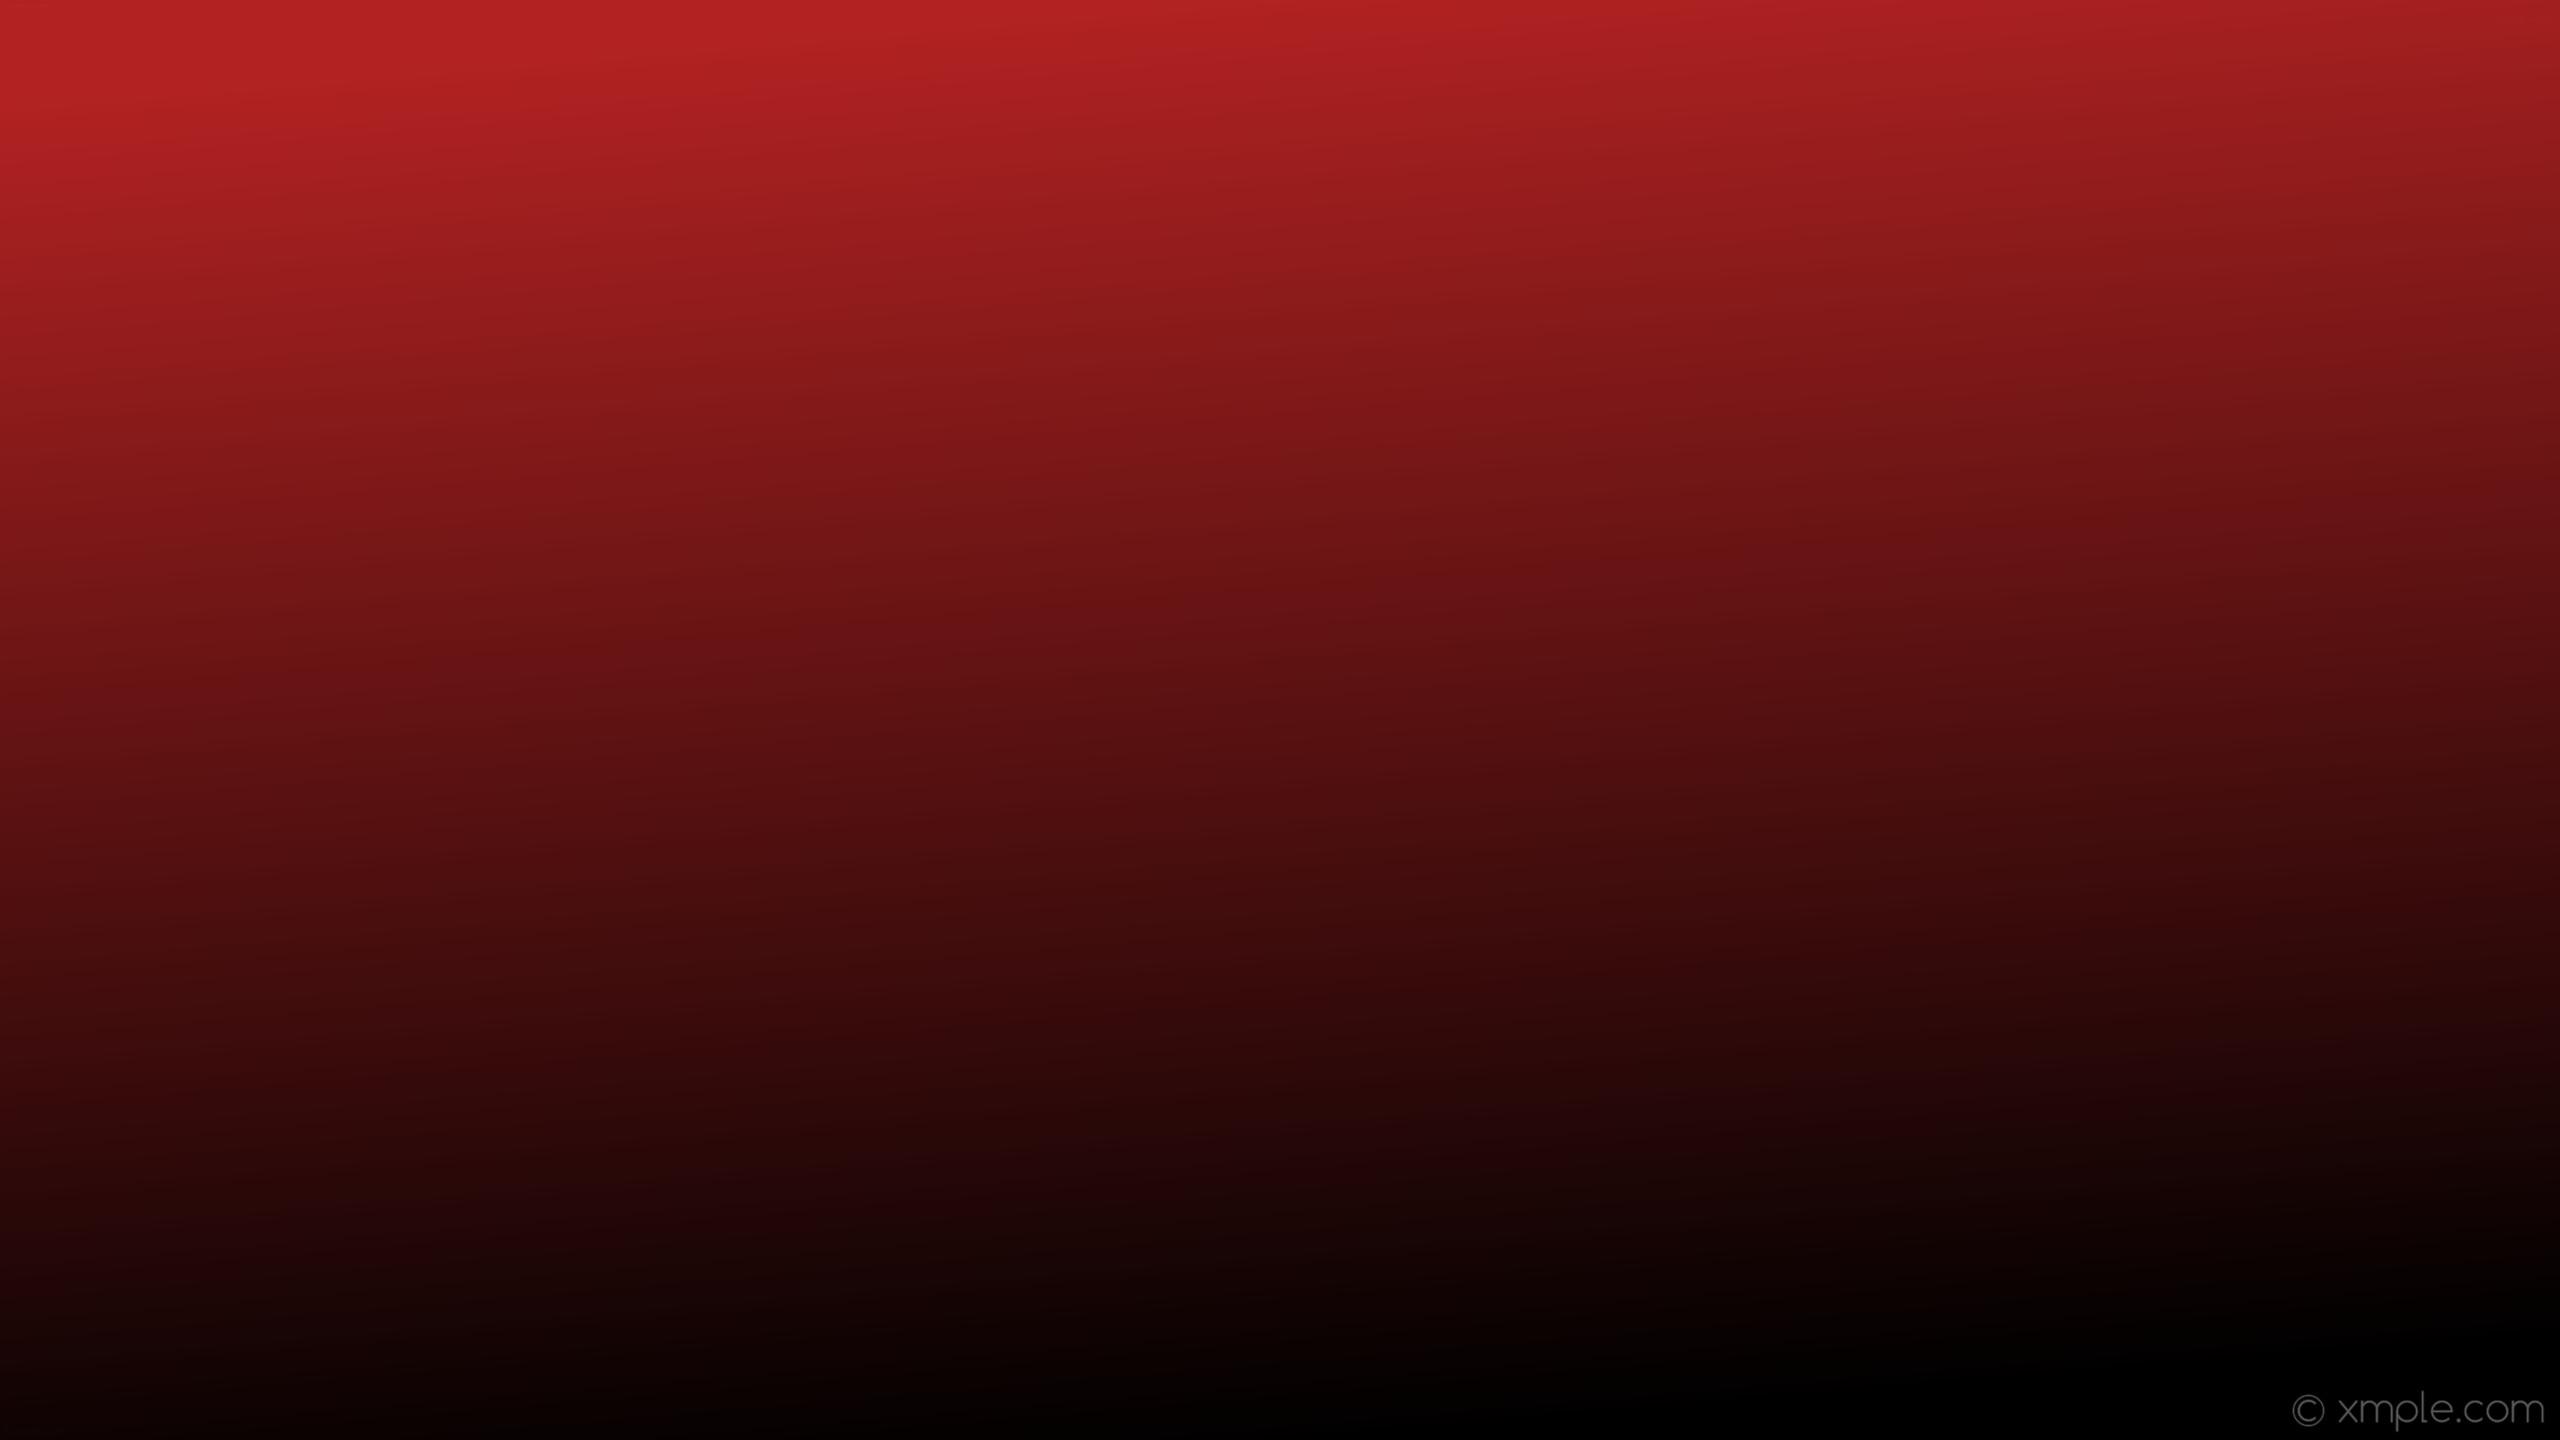 wallpaper black red gradient linear fire brick #000000 #b22222 285°.  Wallpaper background black red gradient linear fire brick …